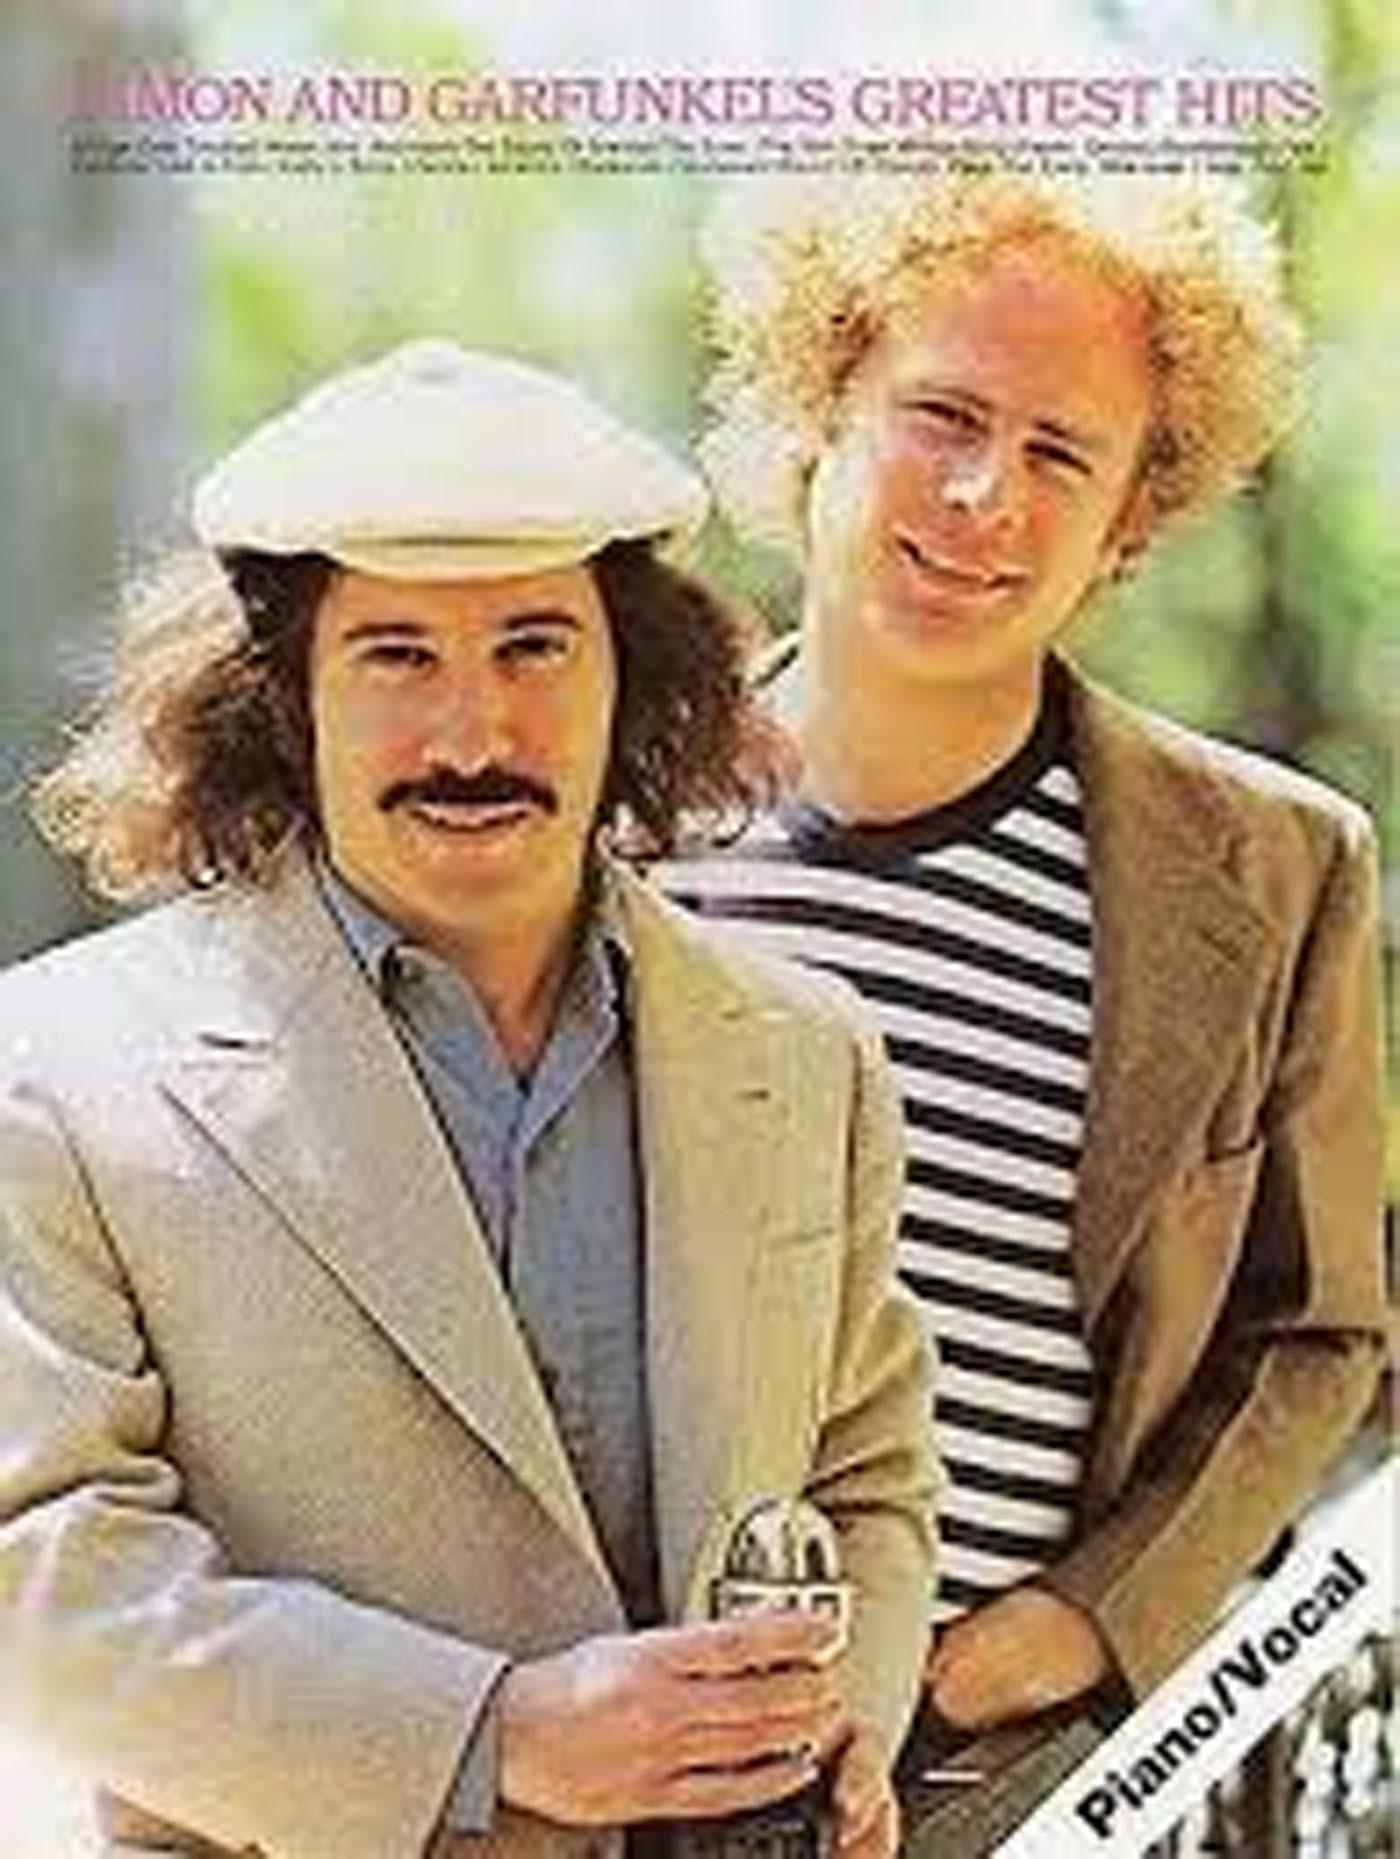 Simon And Garfunkel's Greatest Hits Book Piano Vocal Garfunkel S137